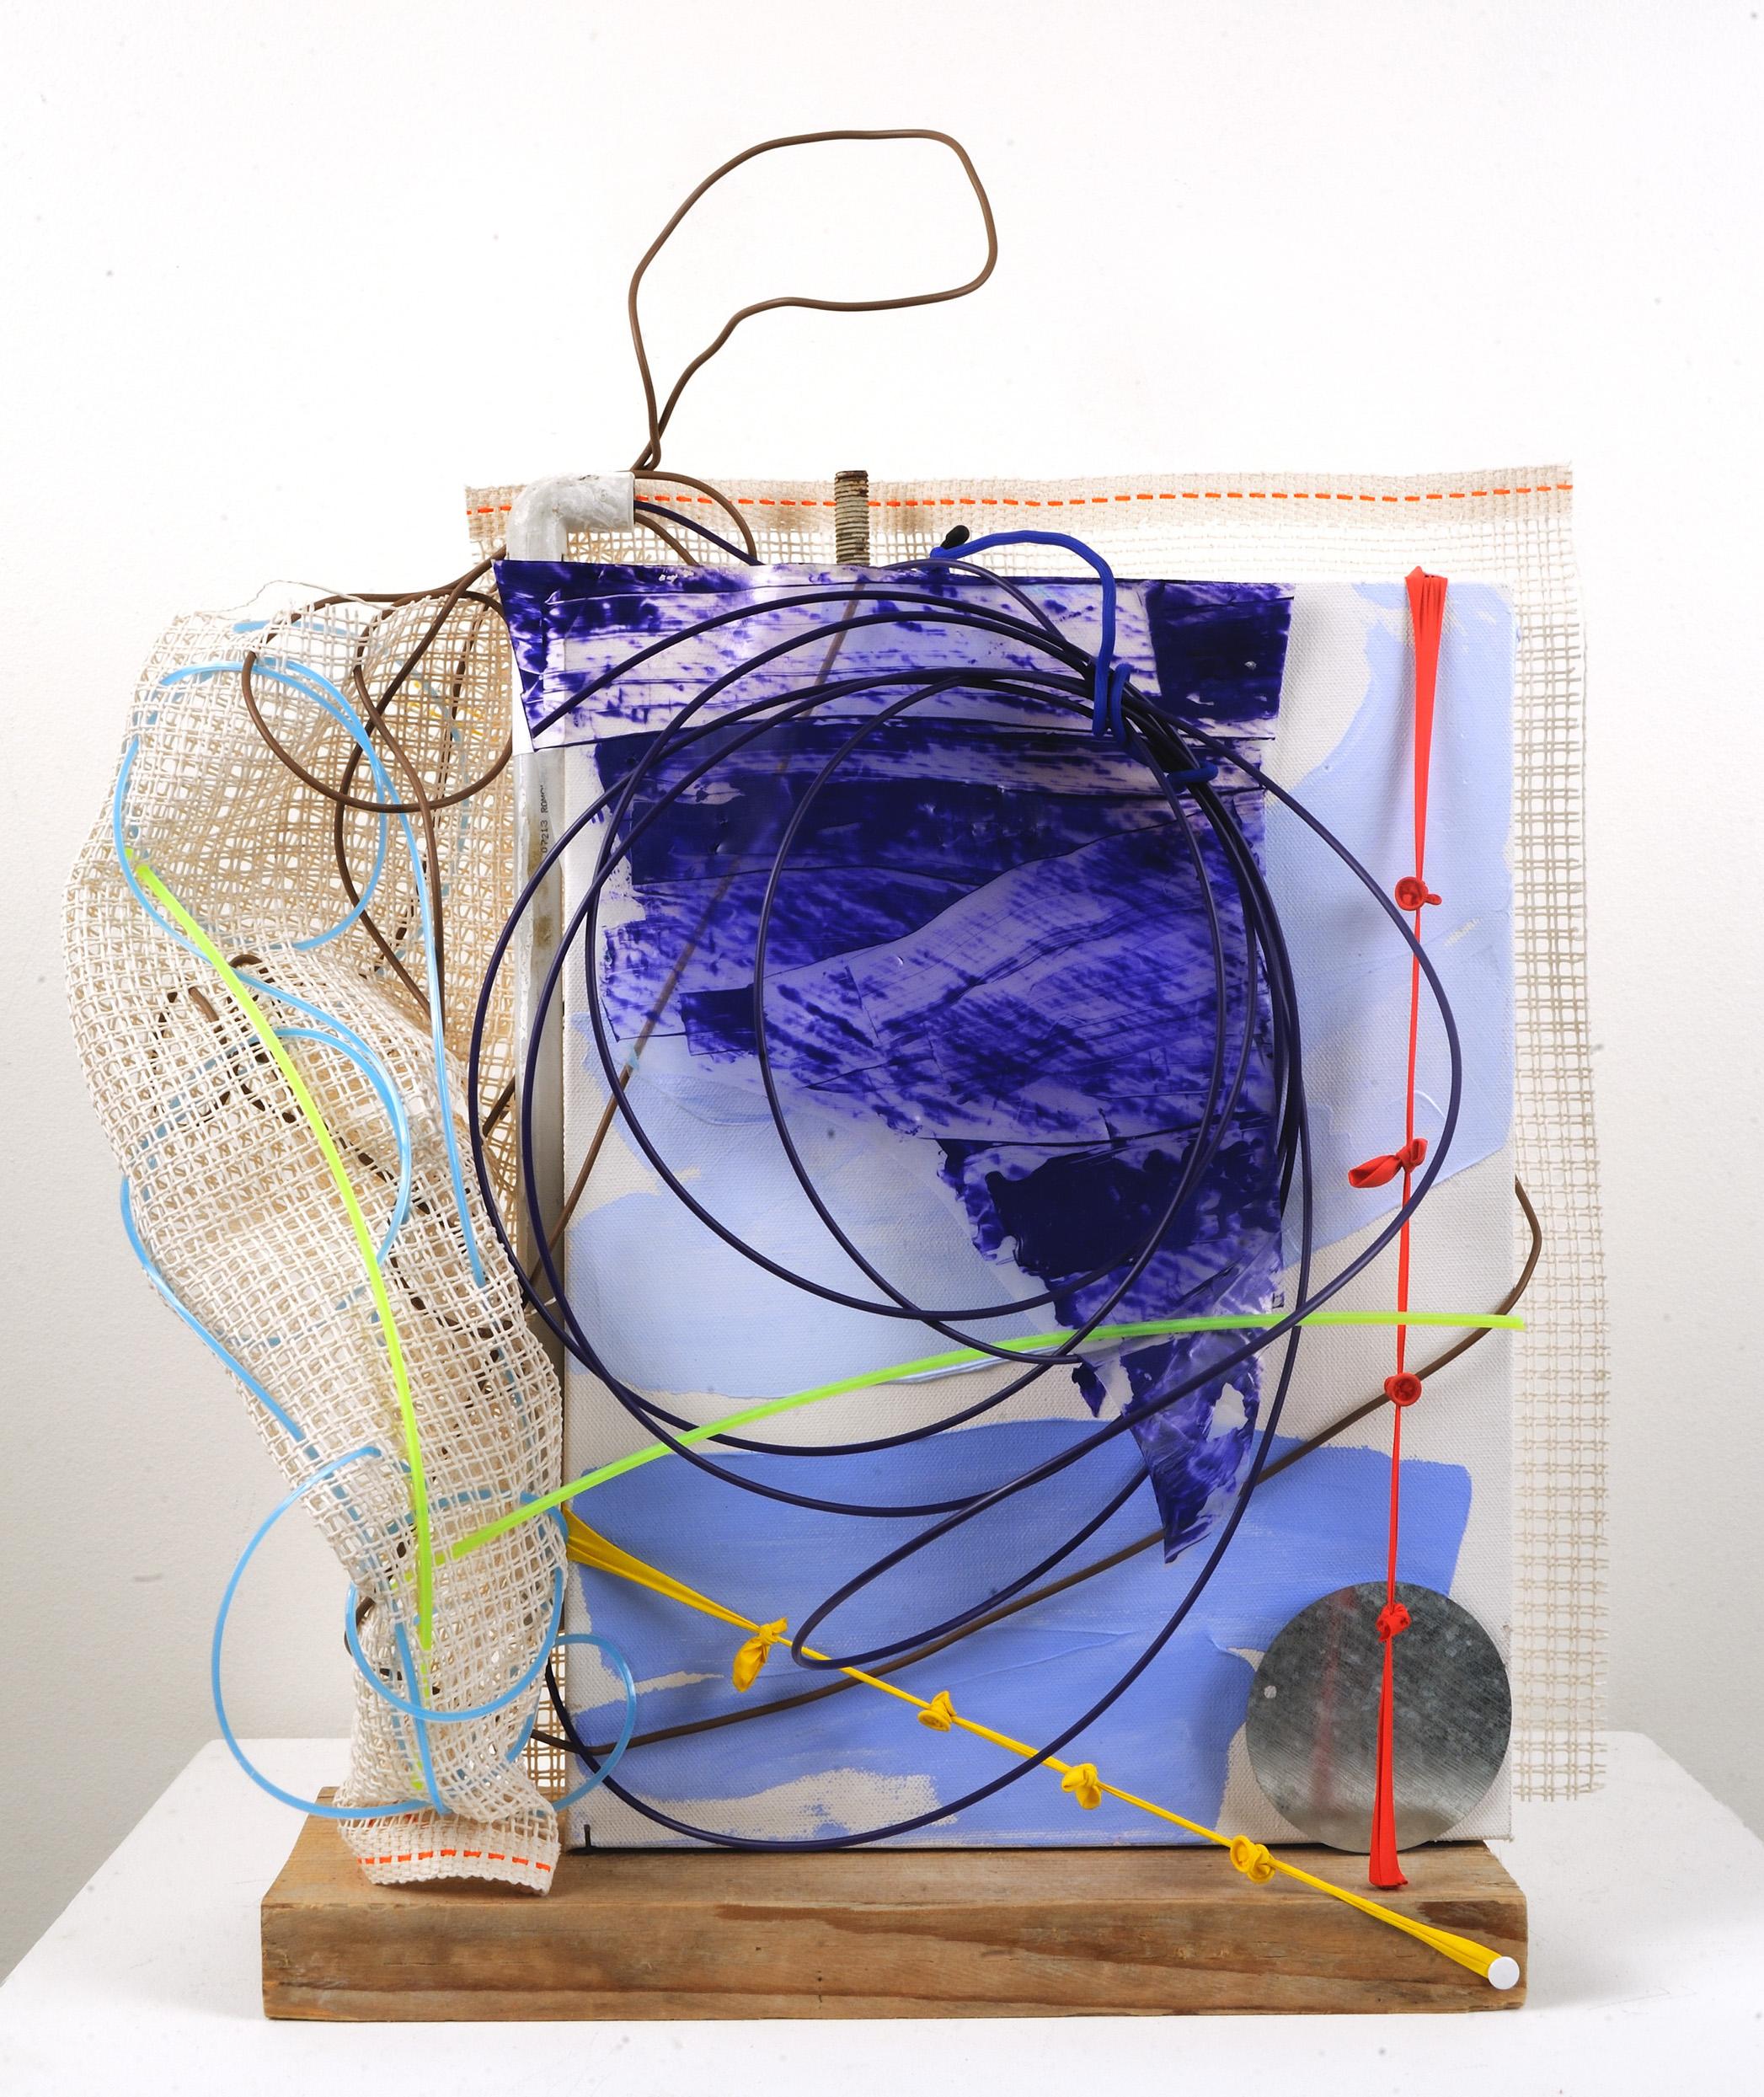 "Tinker's Tale   Jean Jinho Kim  Wooden block, Plastic, Mesh, Balloon, PVC pipe, Steel  23"" x 19"" x 9""  $1,800   Click here to Inquire"